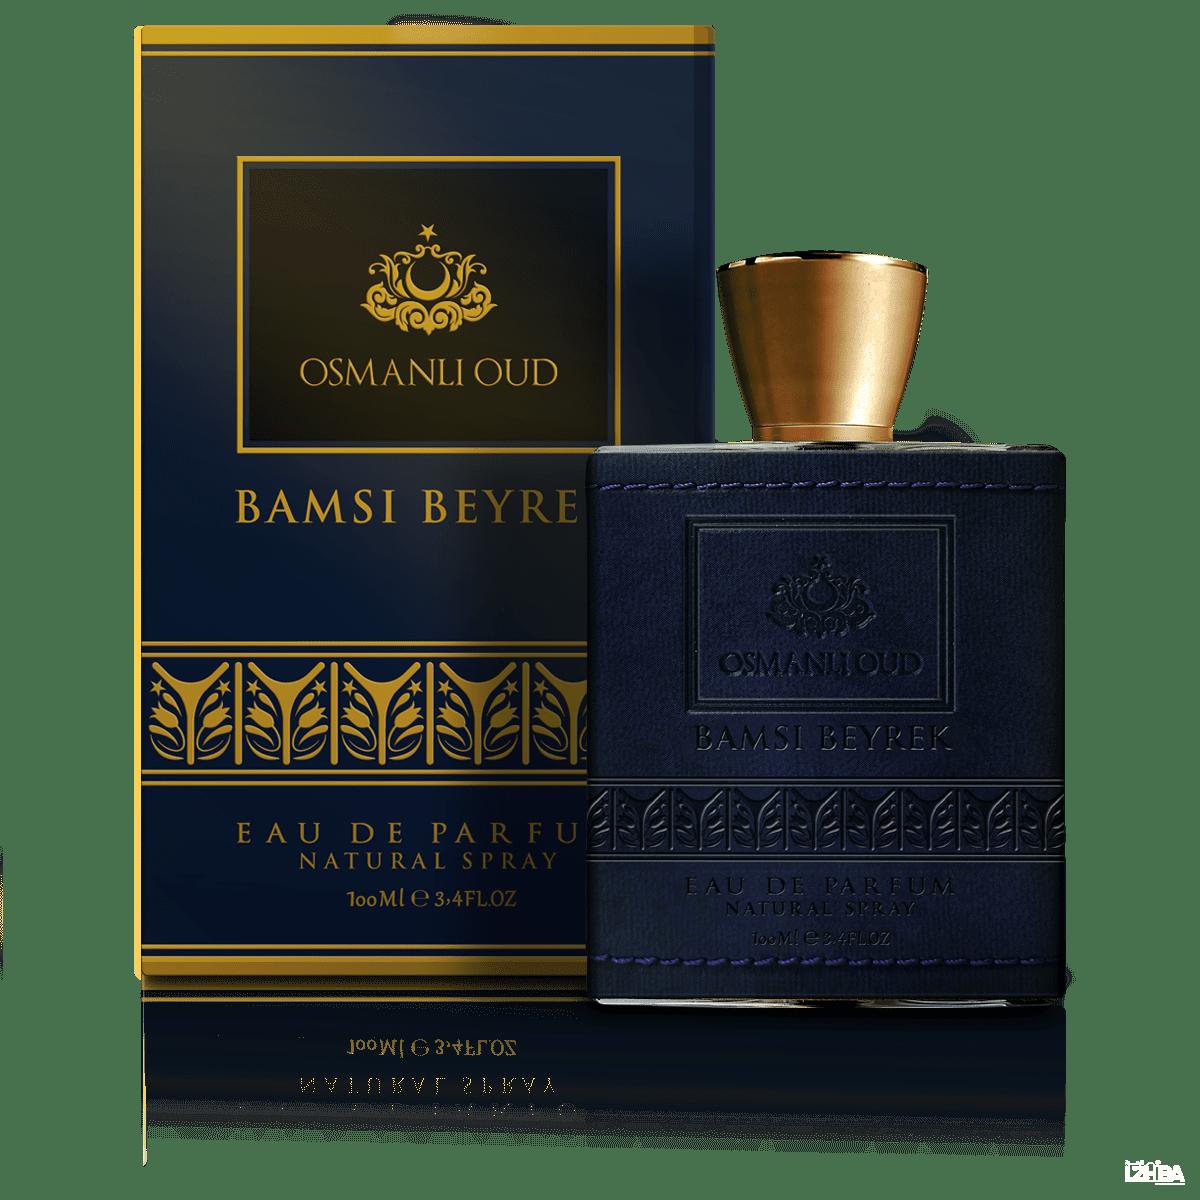 Bamsi Beyrek EDP Perfume 100 ML